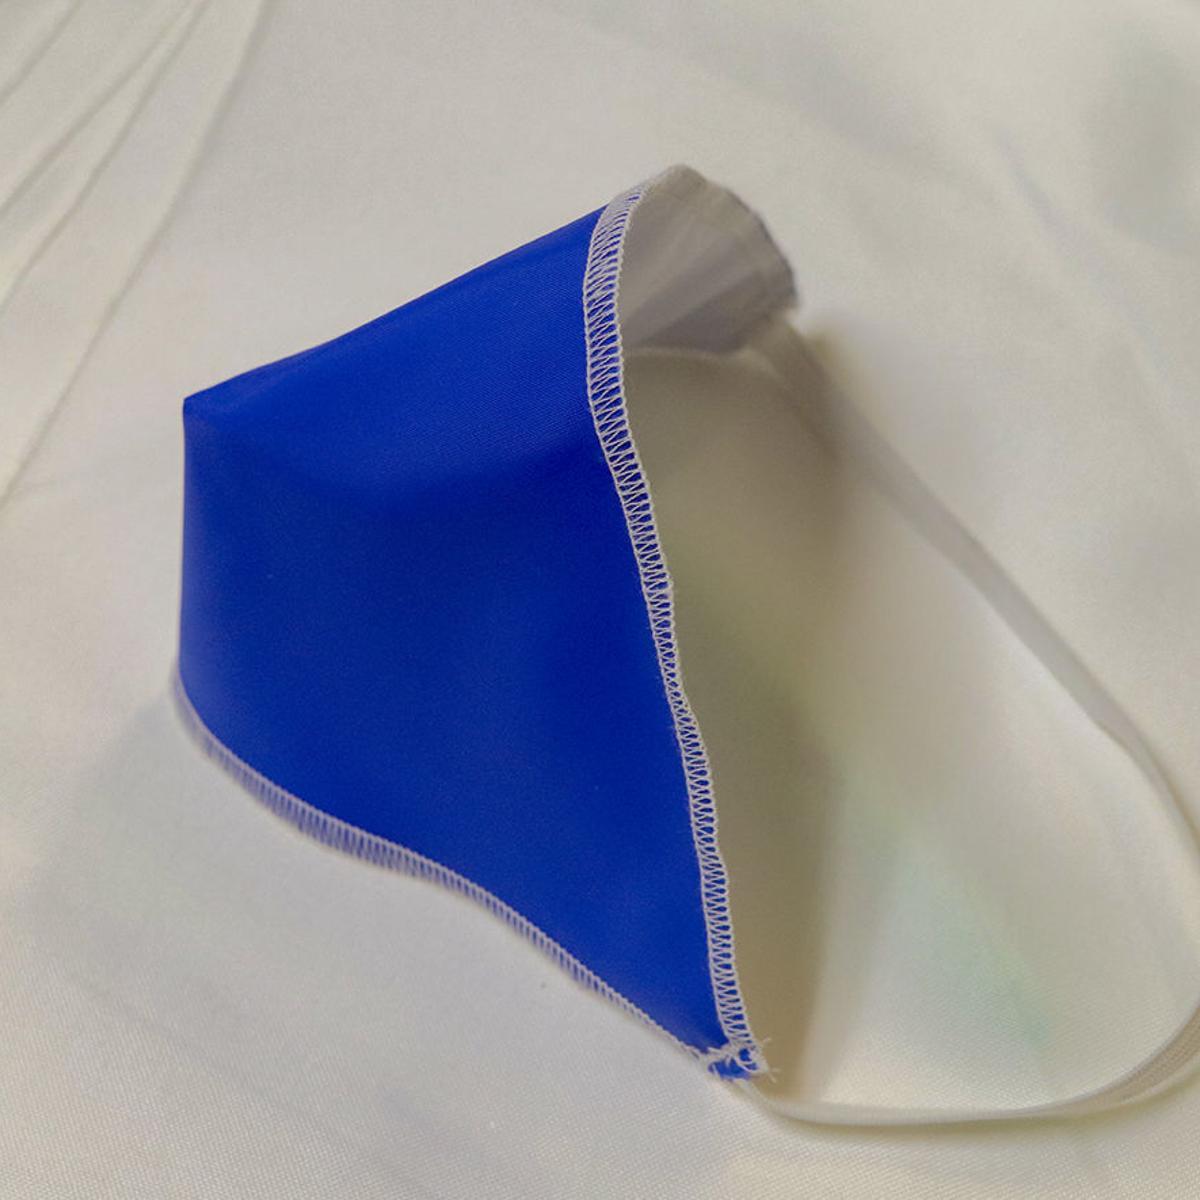 prison inmates making protective masks